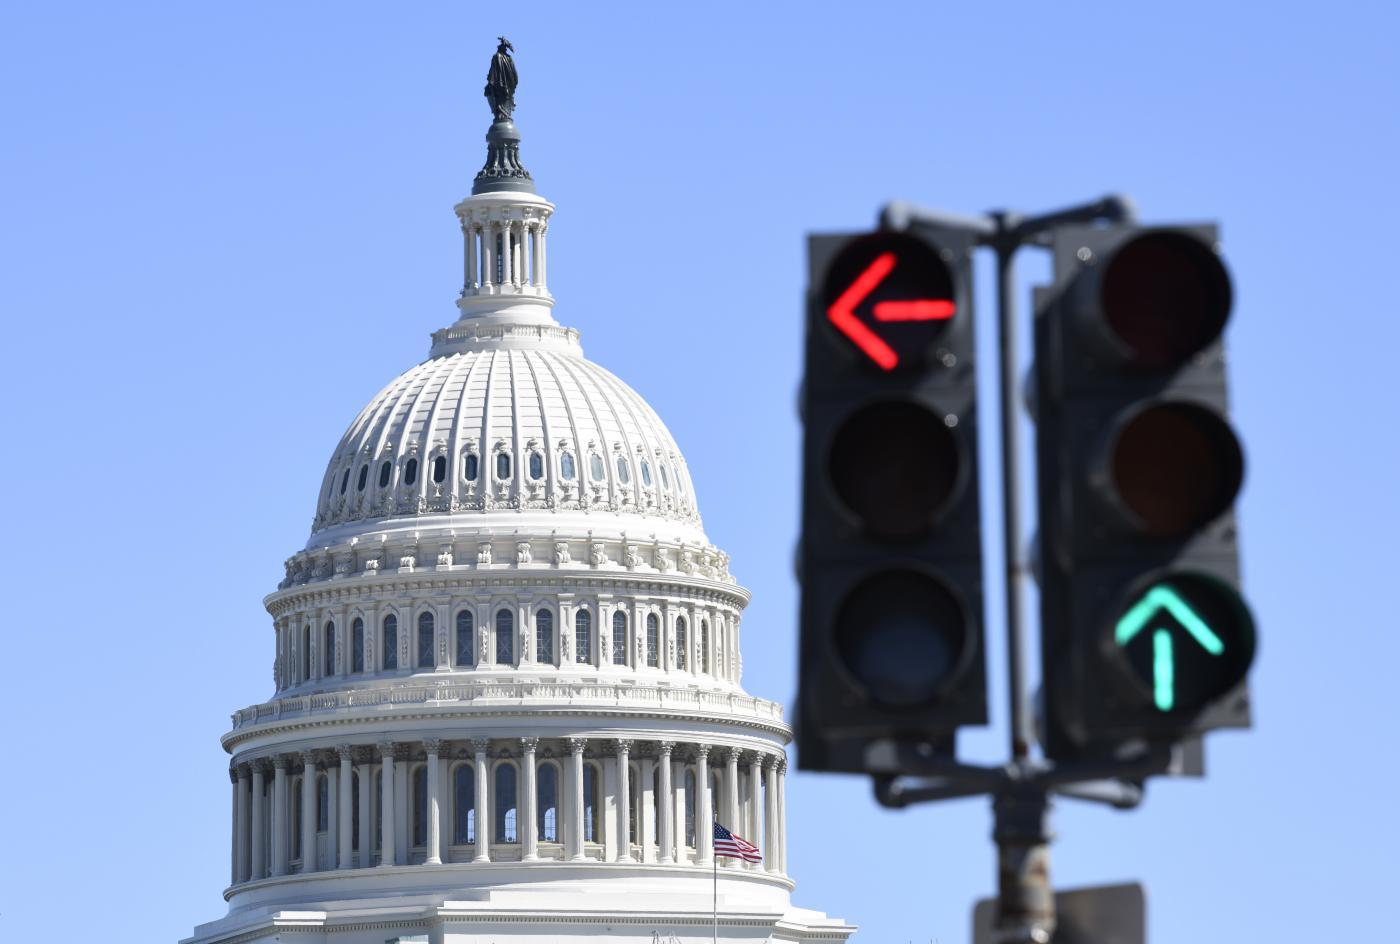 U.S.-WASHINGTON D.C.-HOUSE-TRUMP'S VETO-OVERRIDING-FAILURE by .